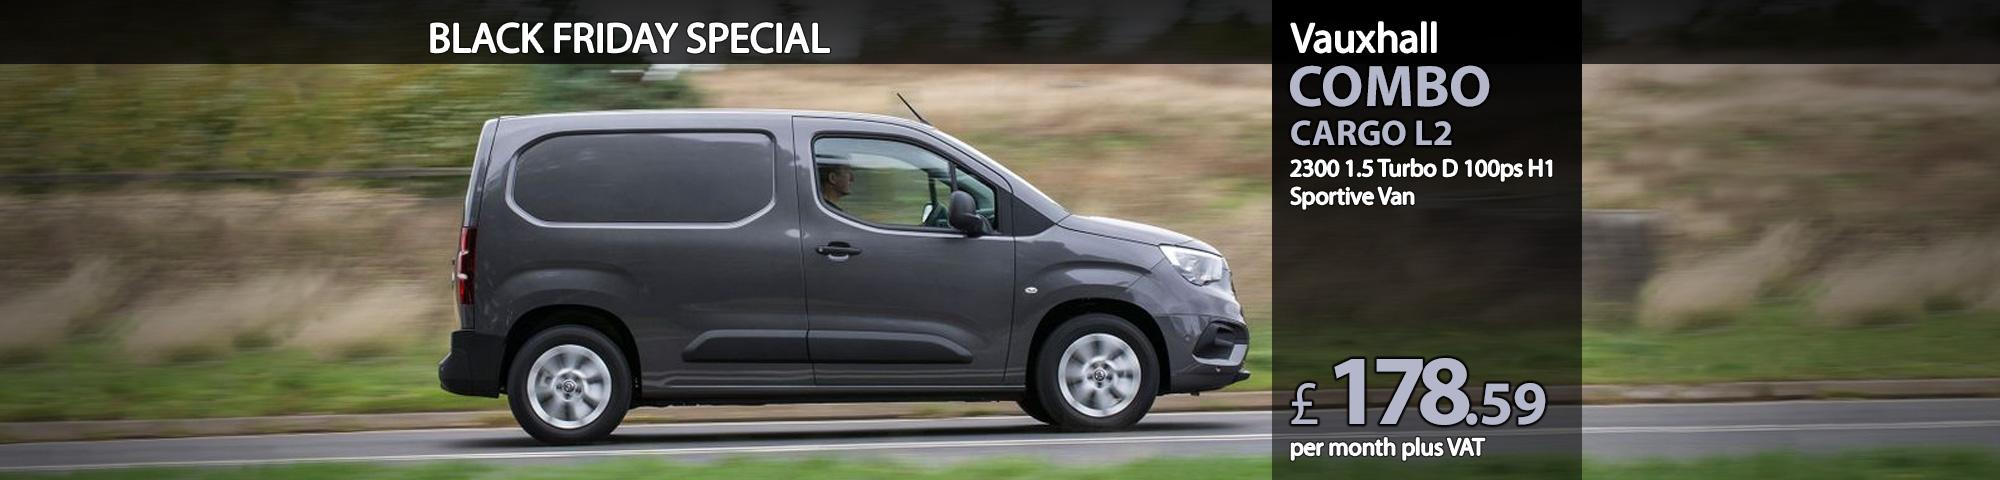 Vauxhall COMBO CARGO L2 2300 1.5 Turbo D 100ps H1 Sportive Van